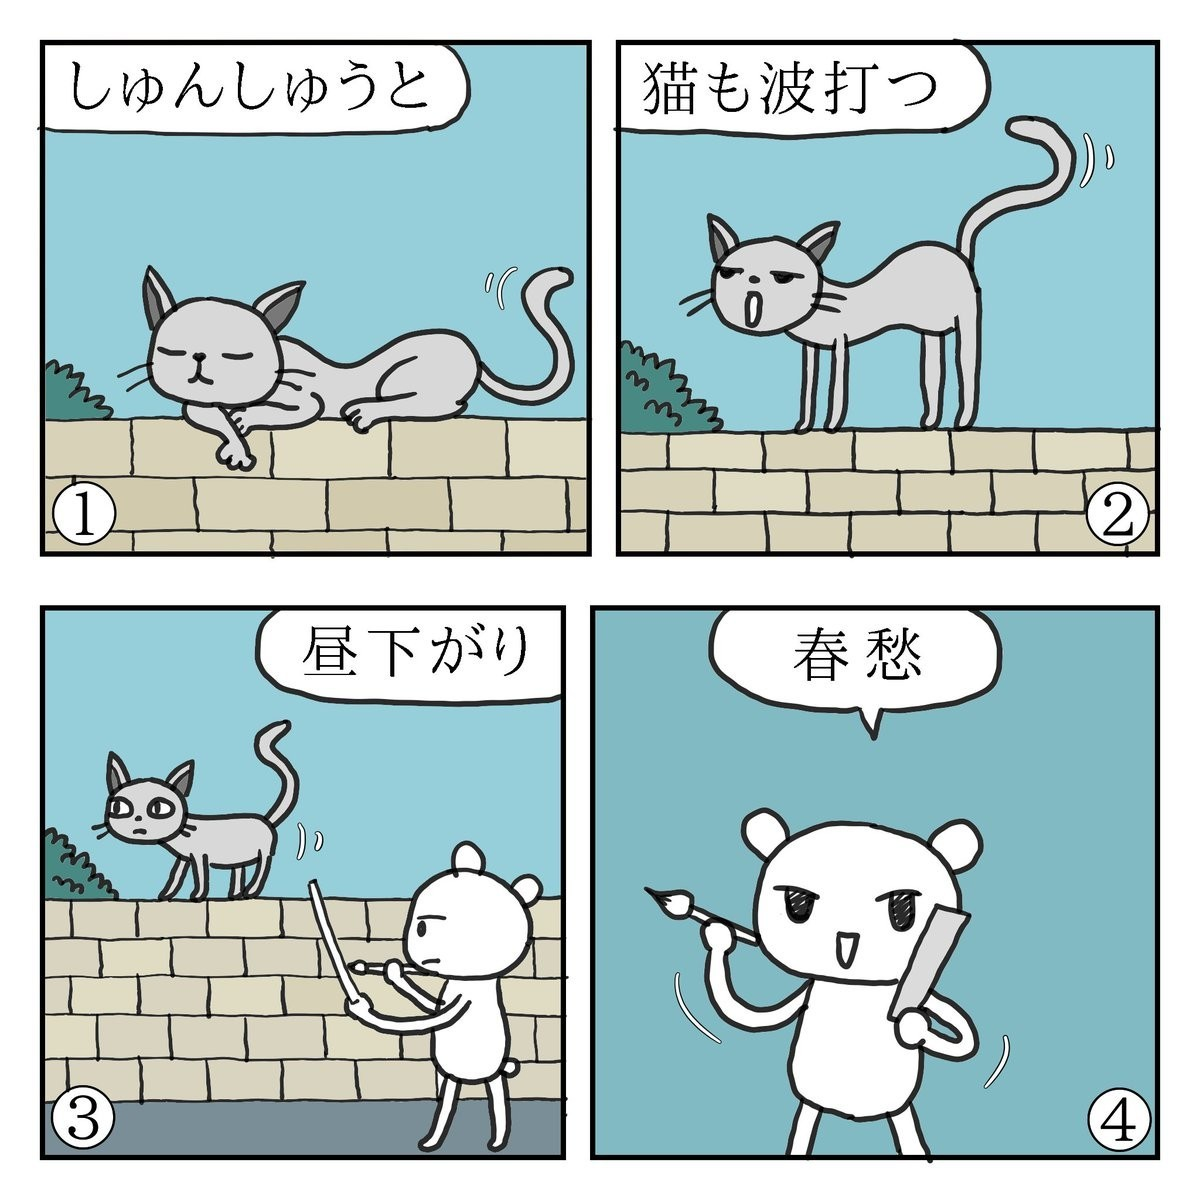 f:id:kanarihikokuma:20190316173144j:image:w330